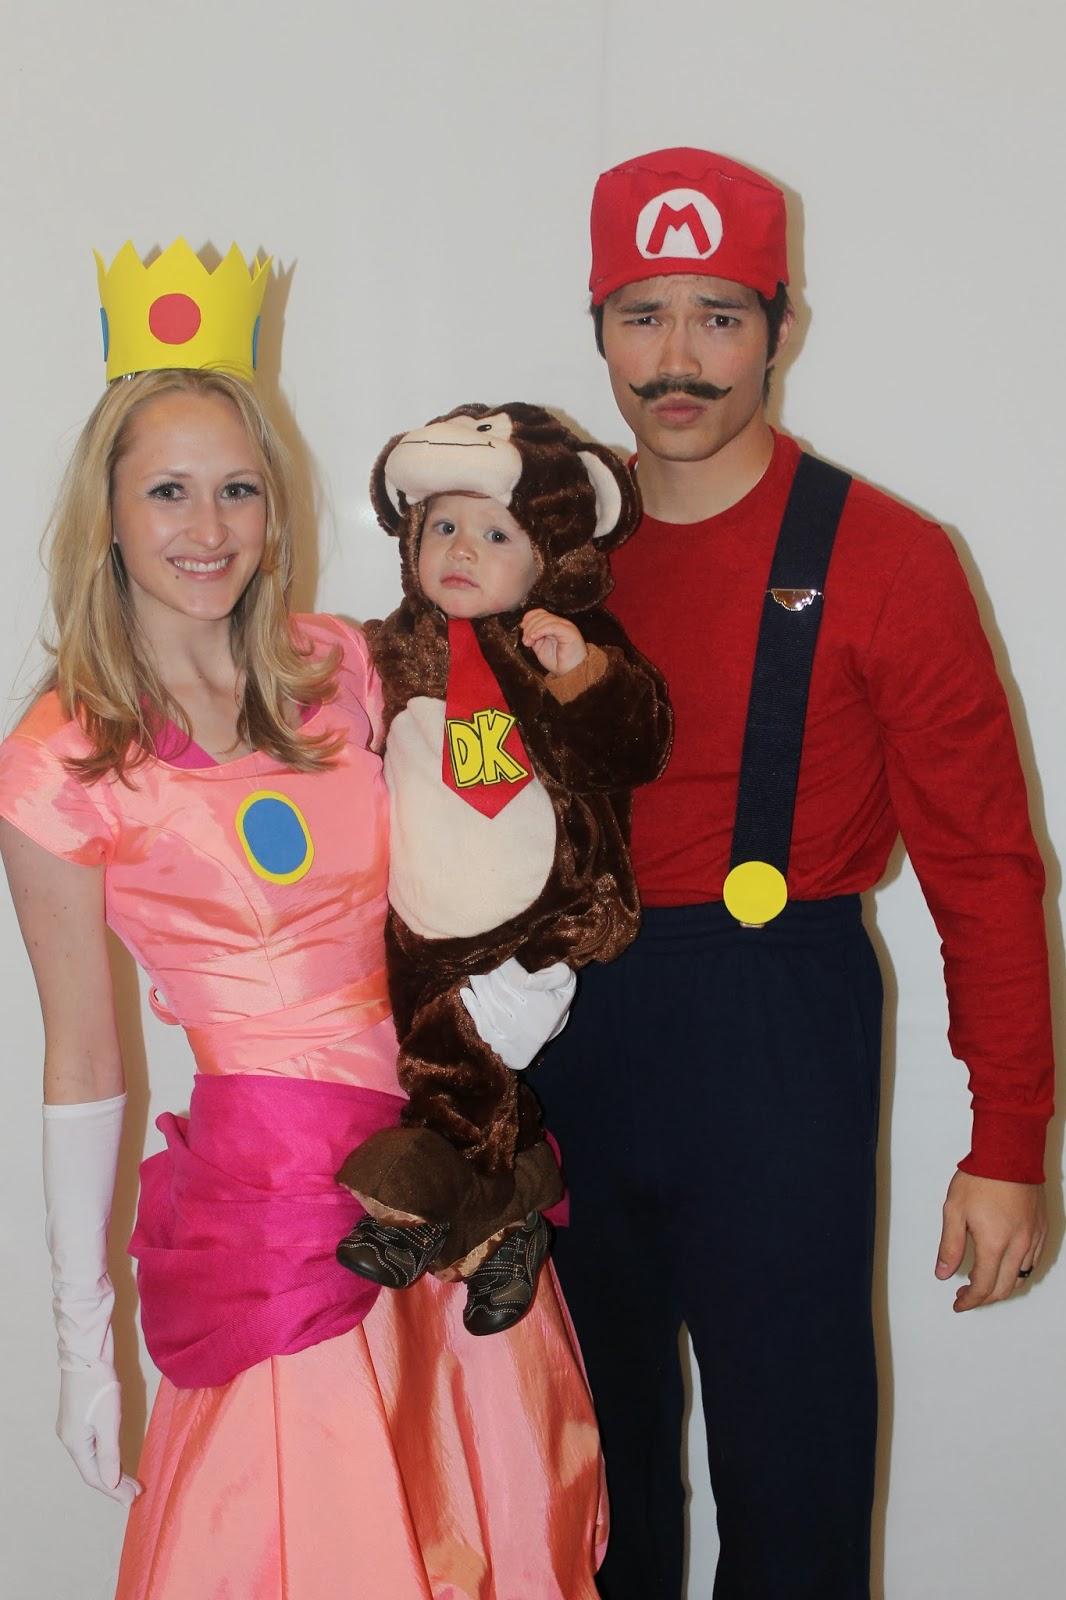 diddy kong halloween costume - the halloween